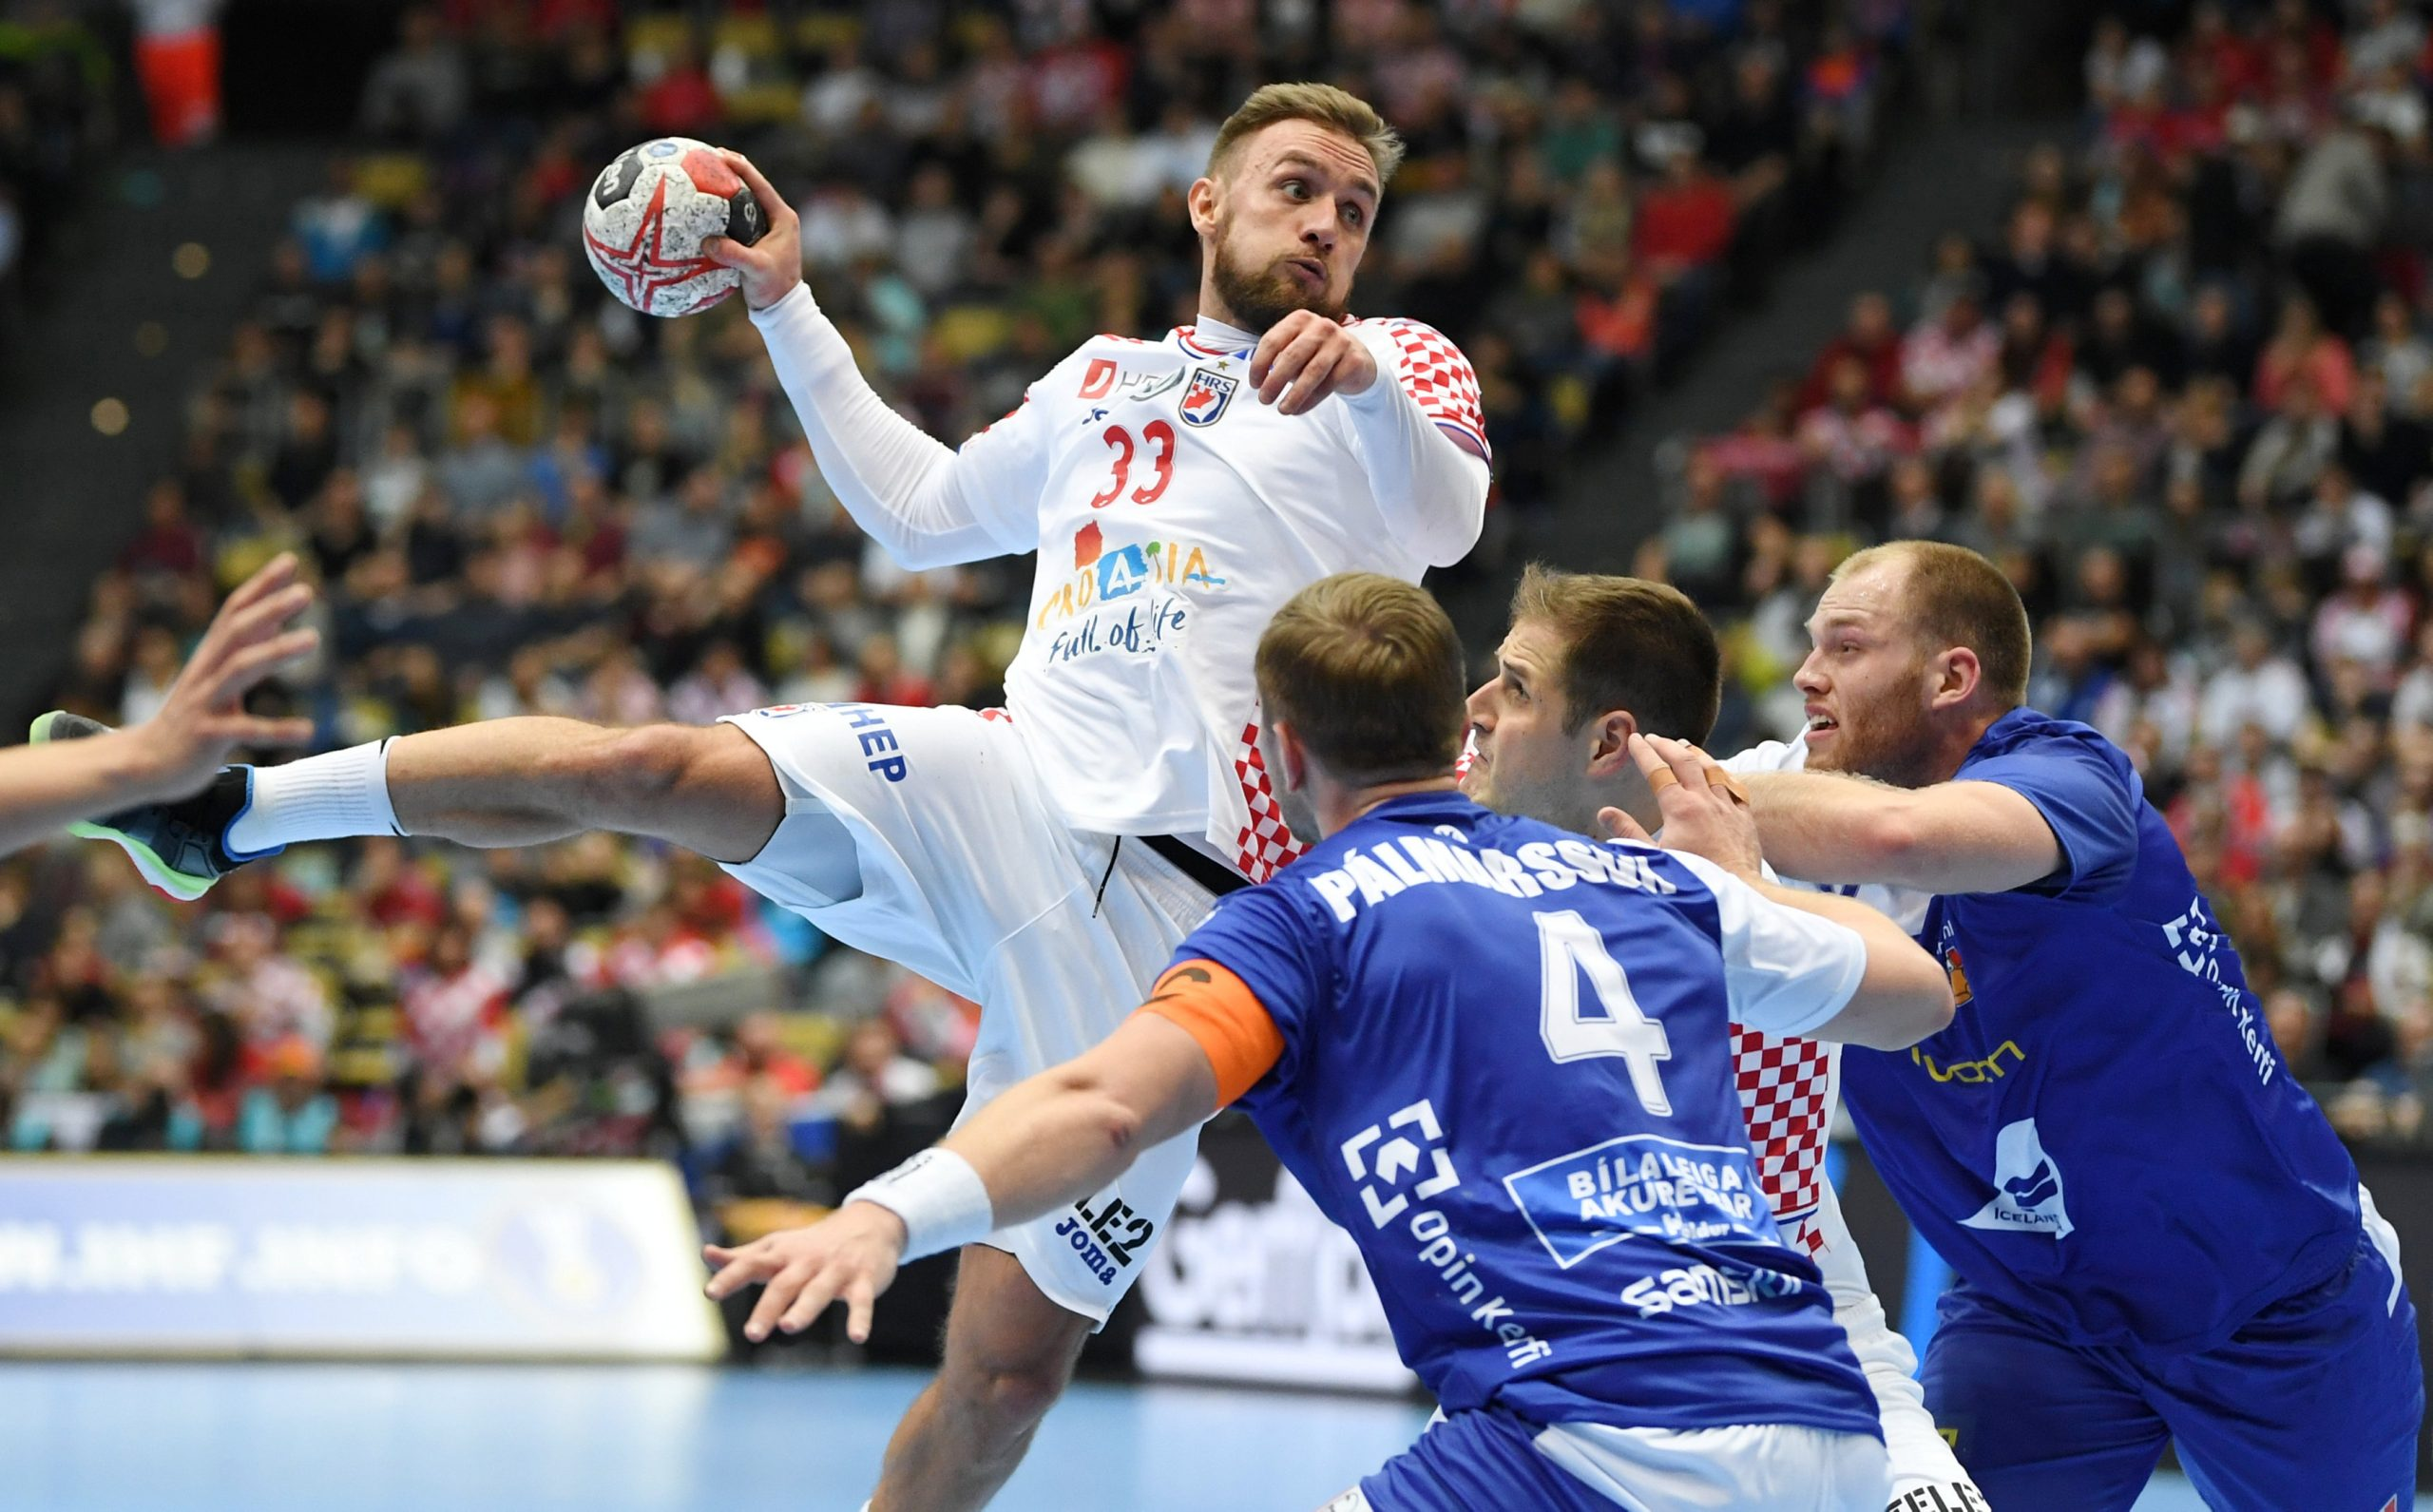 FAVORITI SKUPINE – Luka Cindrić/Foto REUTERS